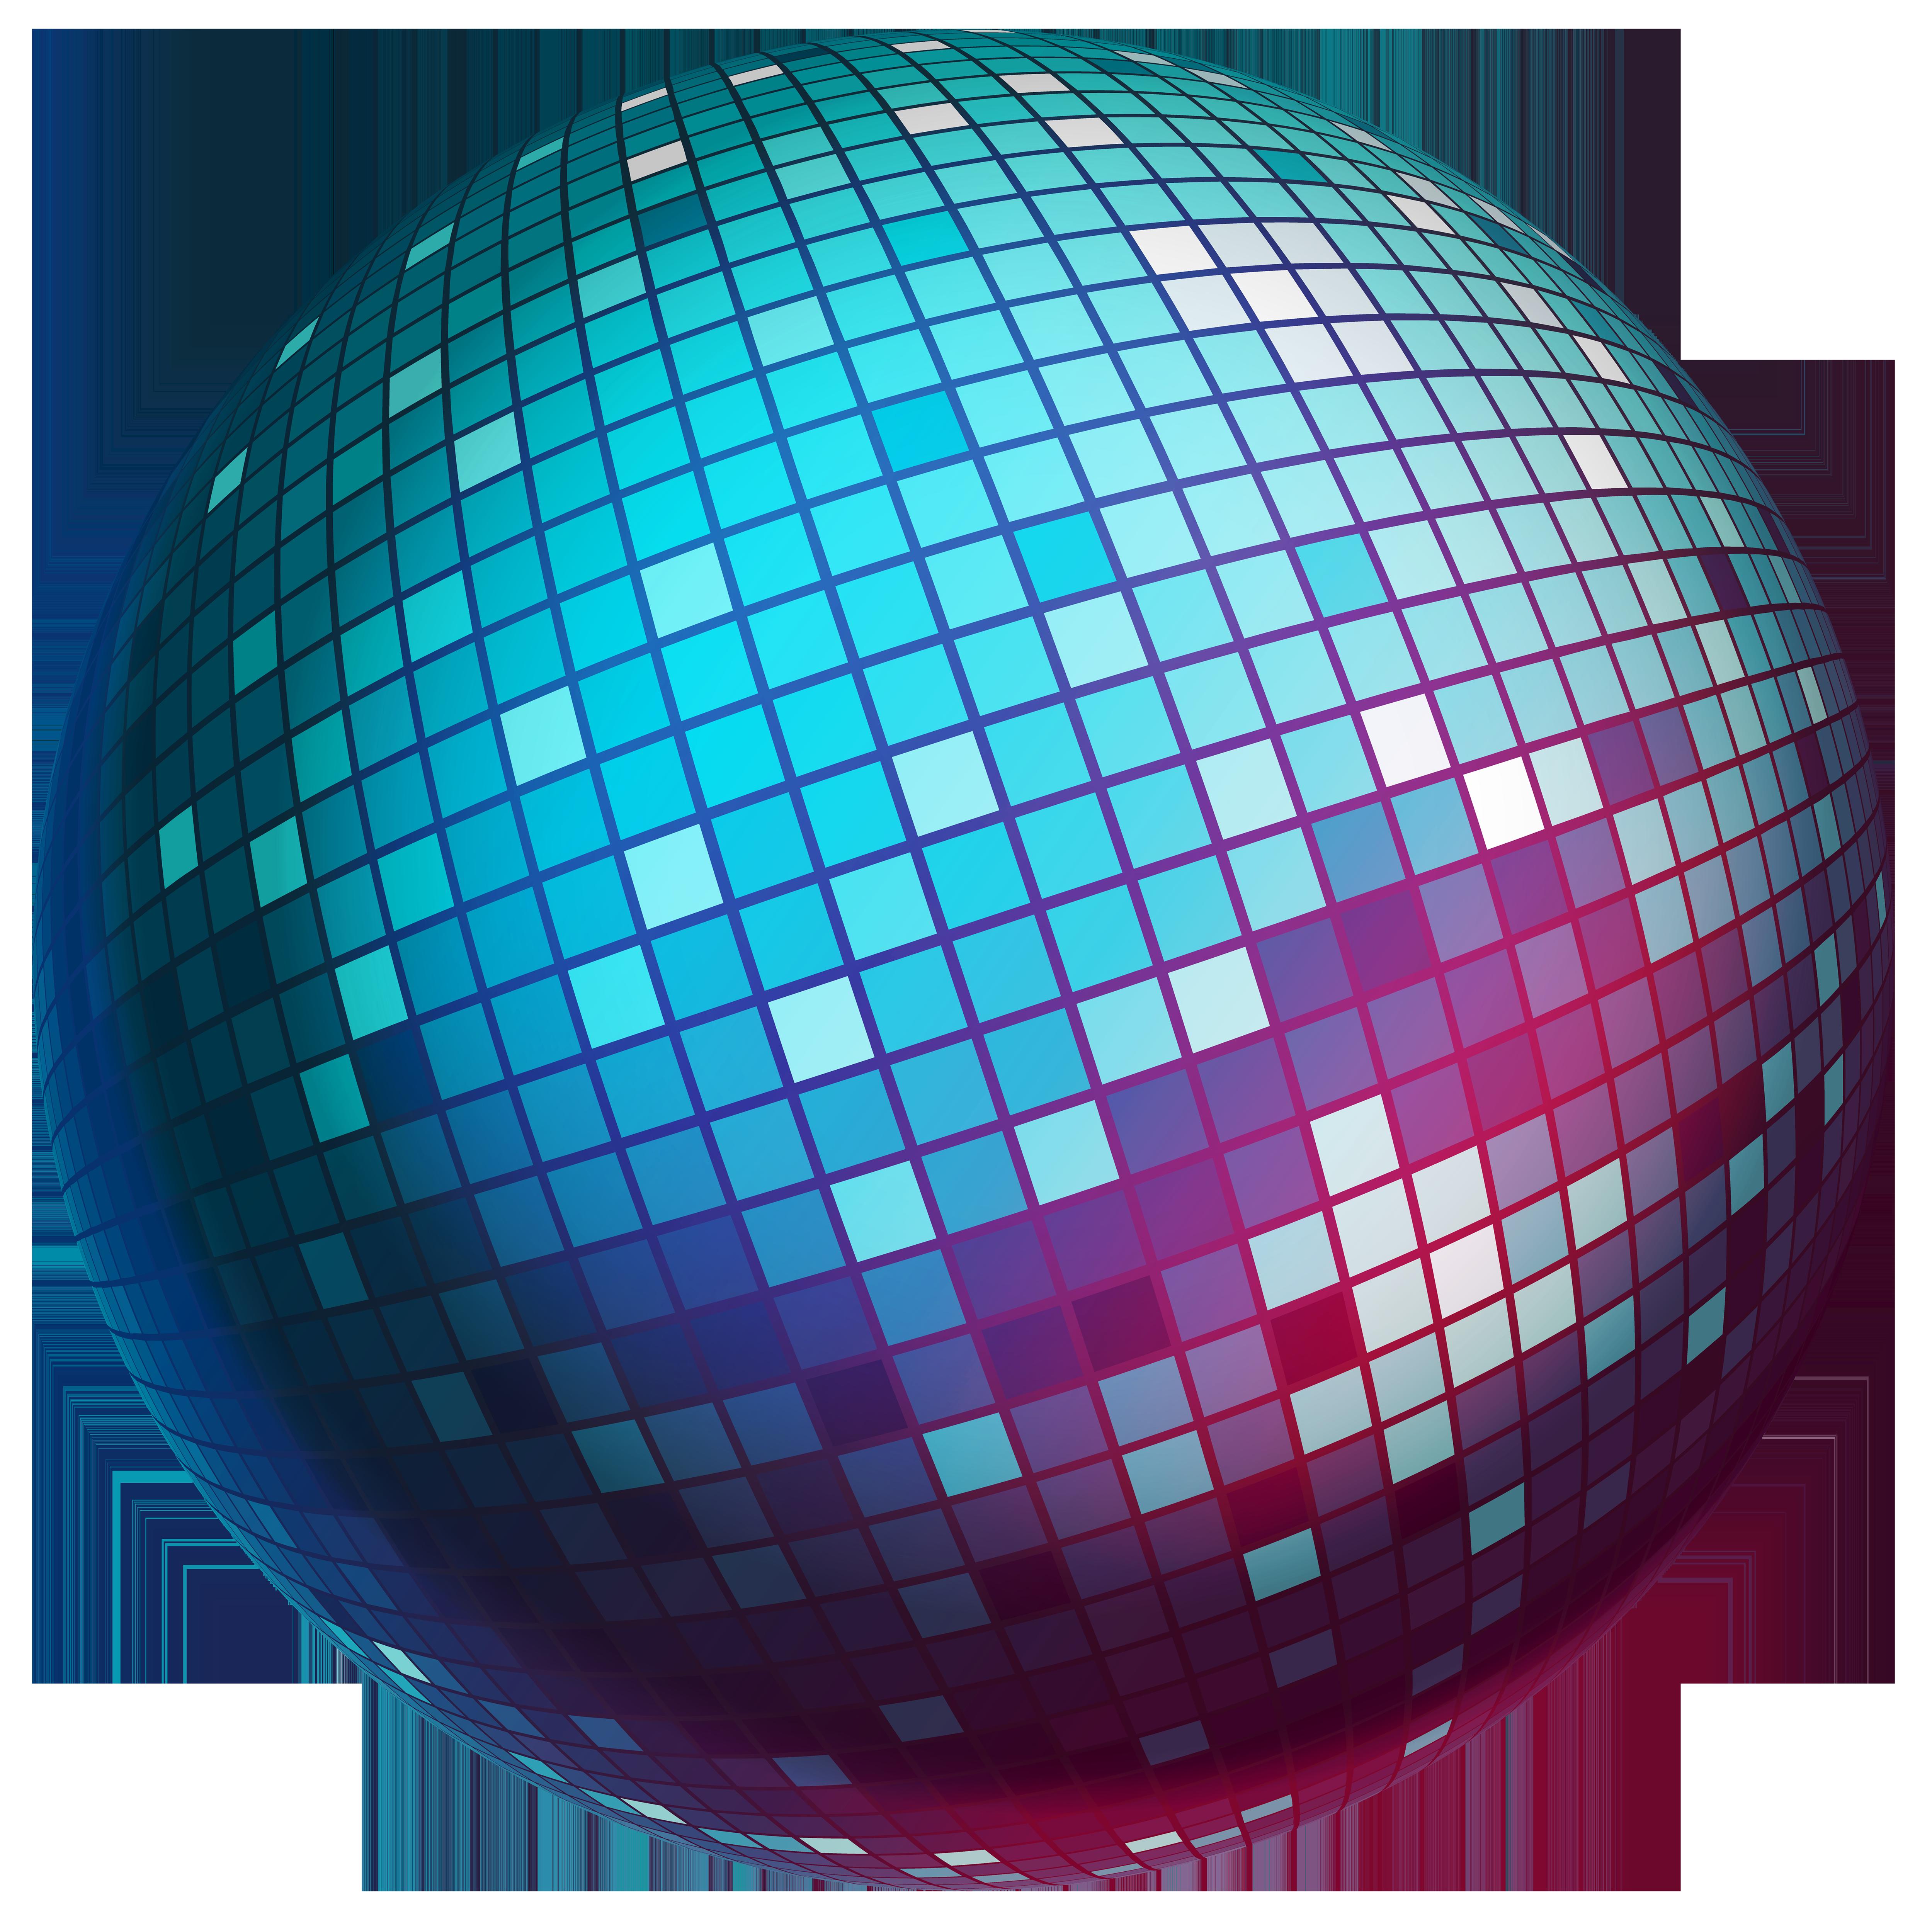 Disco ball clipart clipground - Bola de discoteca ...